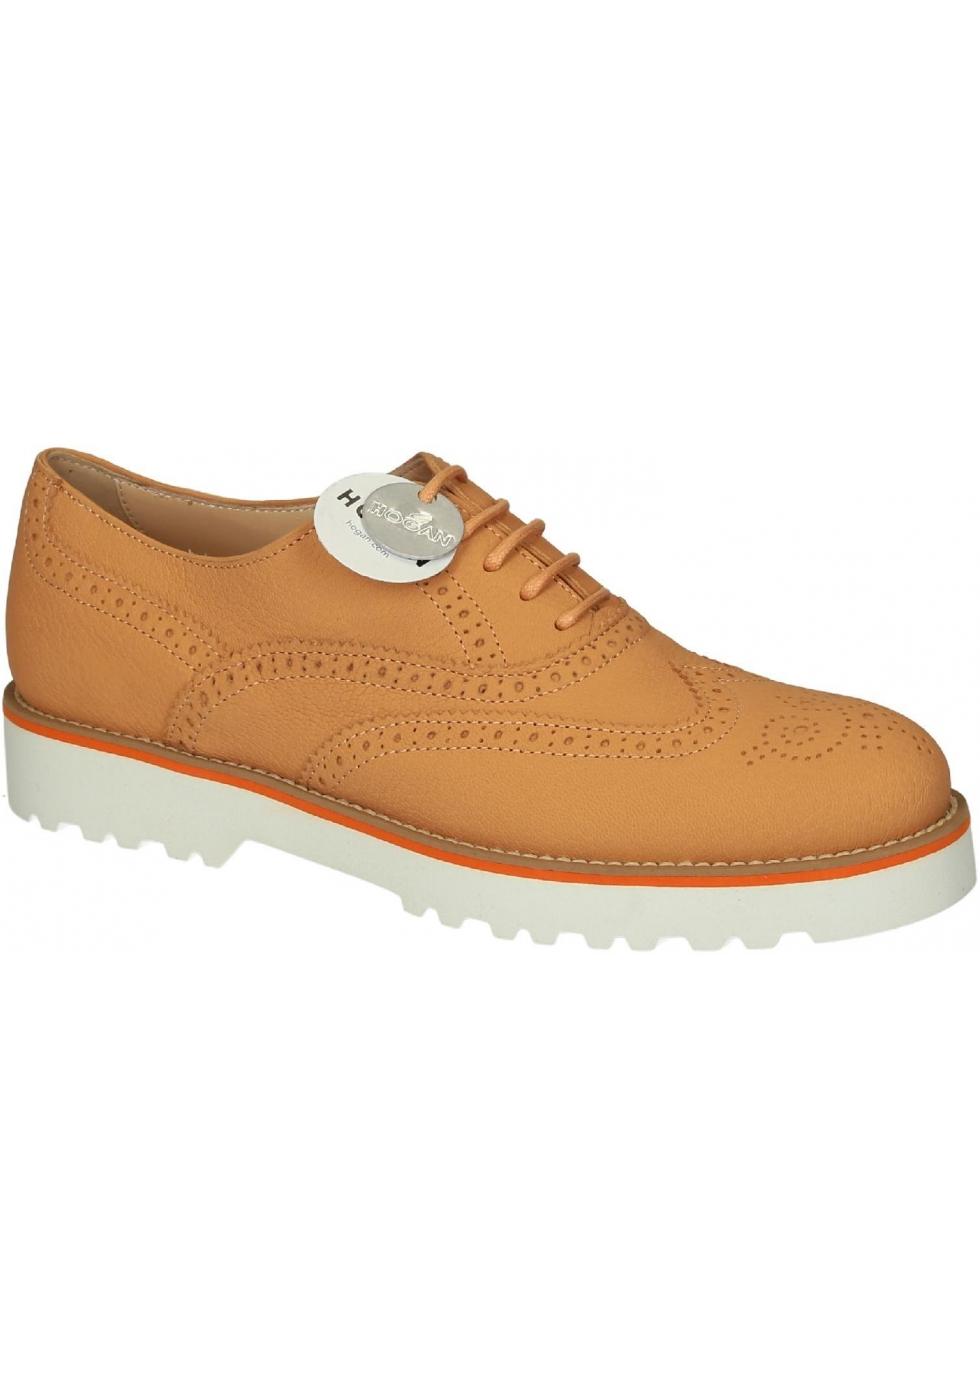 Outlet scarpe donna Hogan originali - Italian Boutique 30378c7bb1f